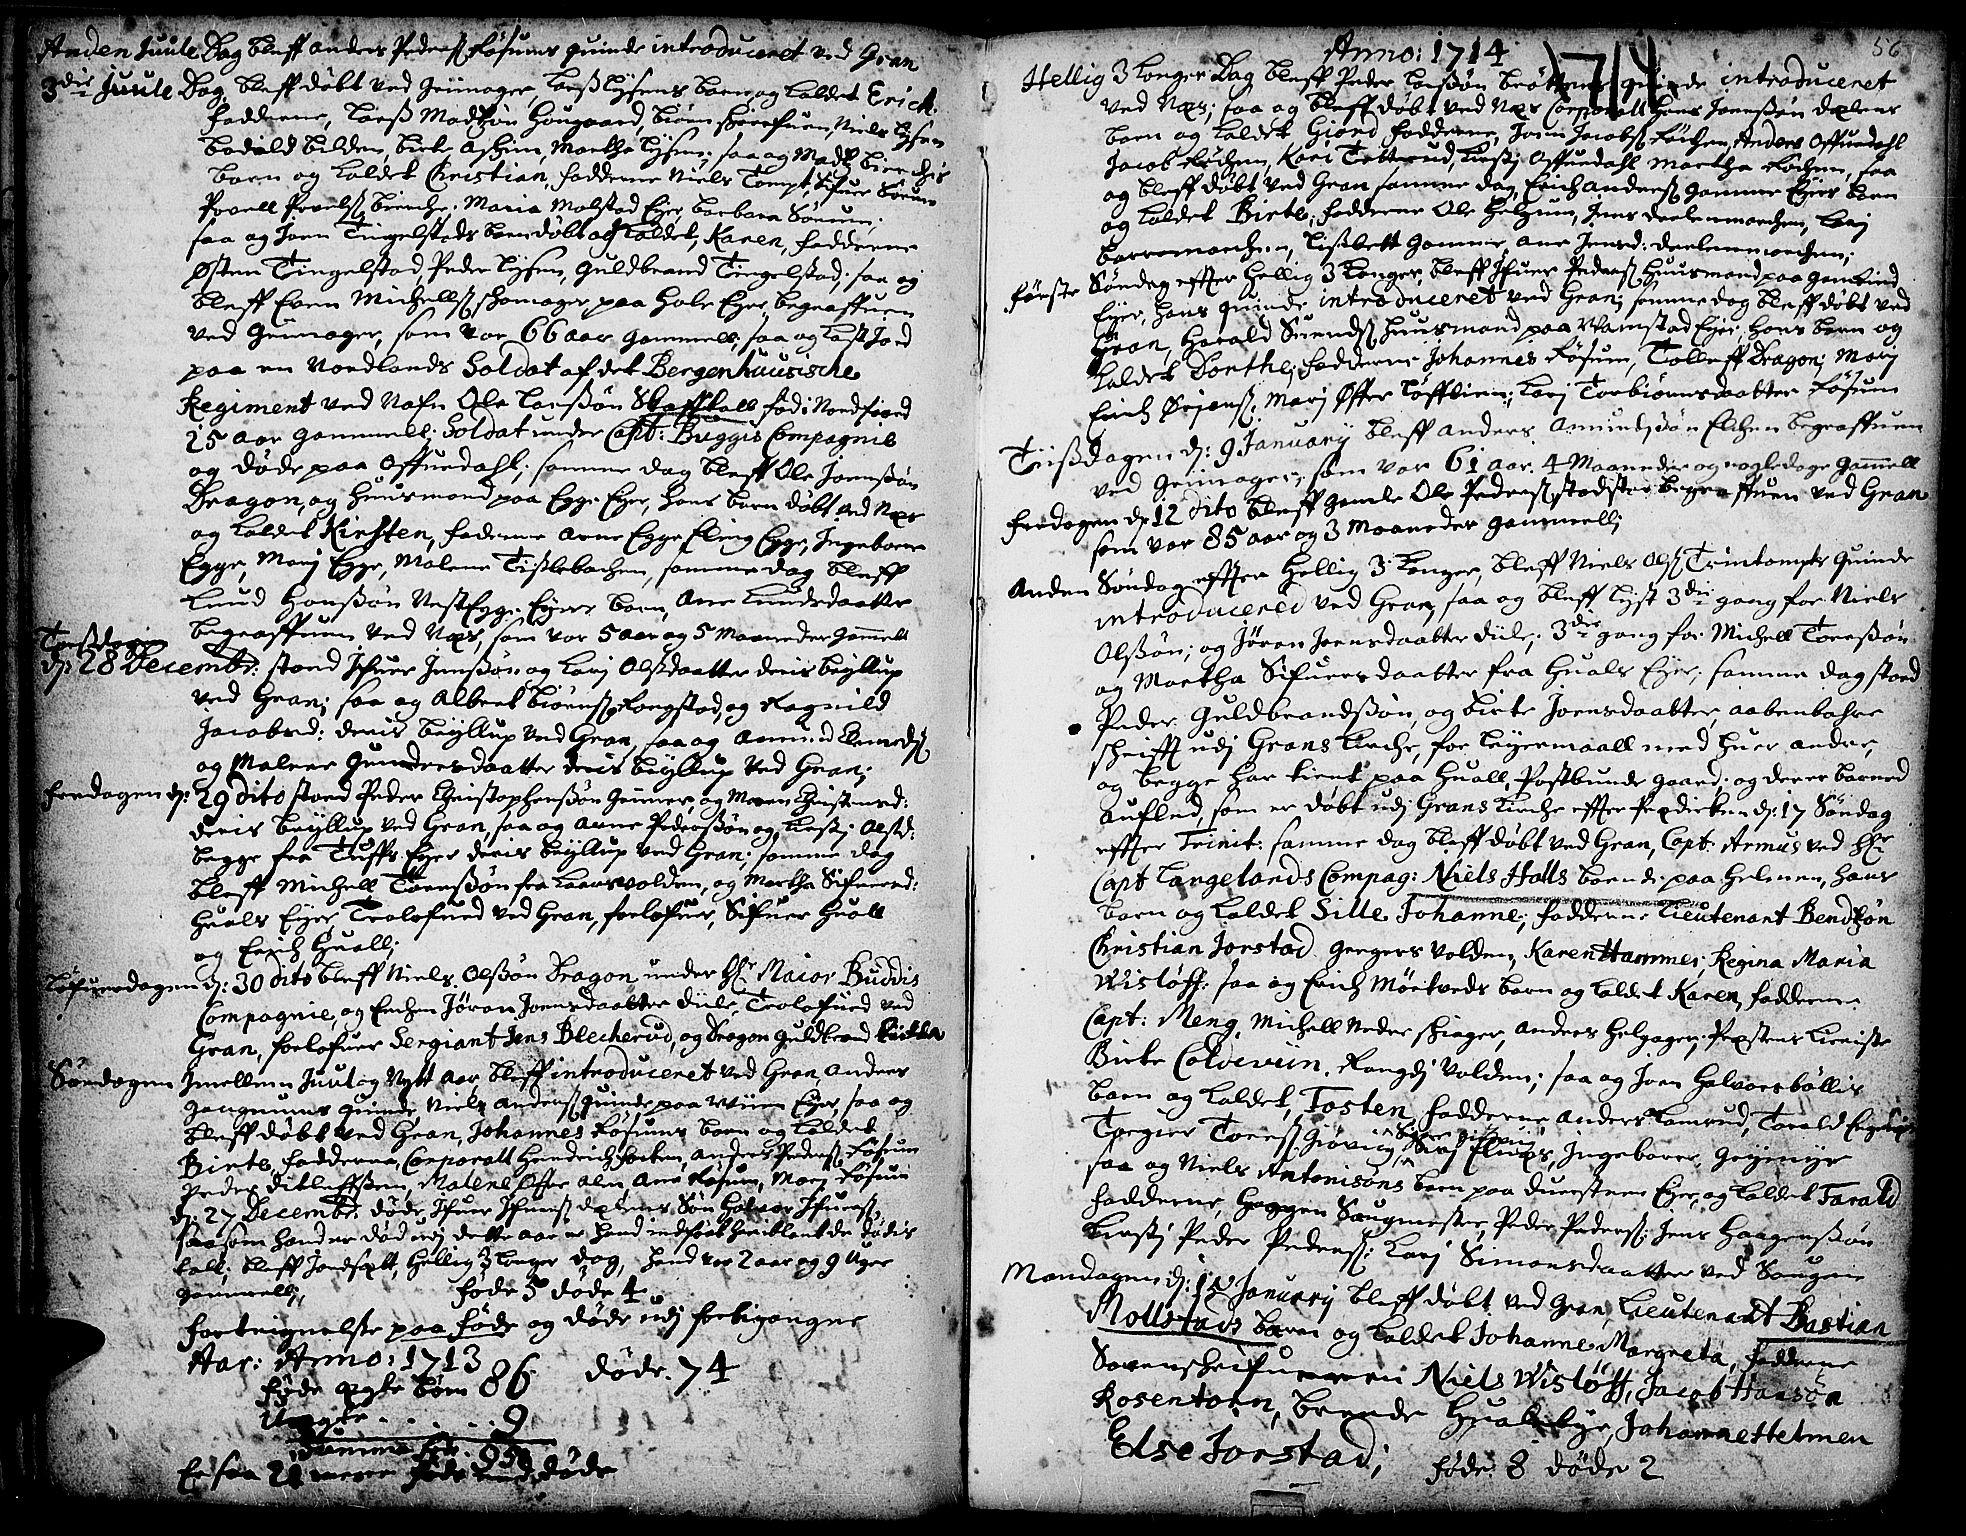 SAH, Gran prestekontor, Ministerialbok nr. 1, 1707-1731, s. 56